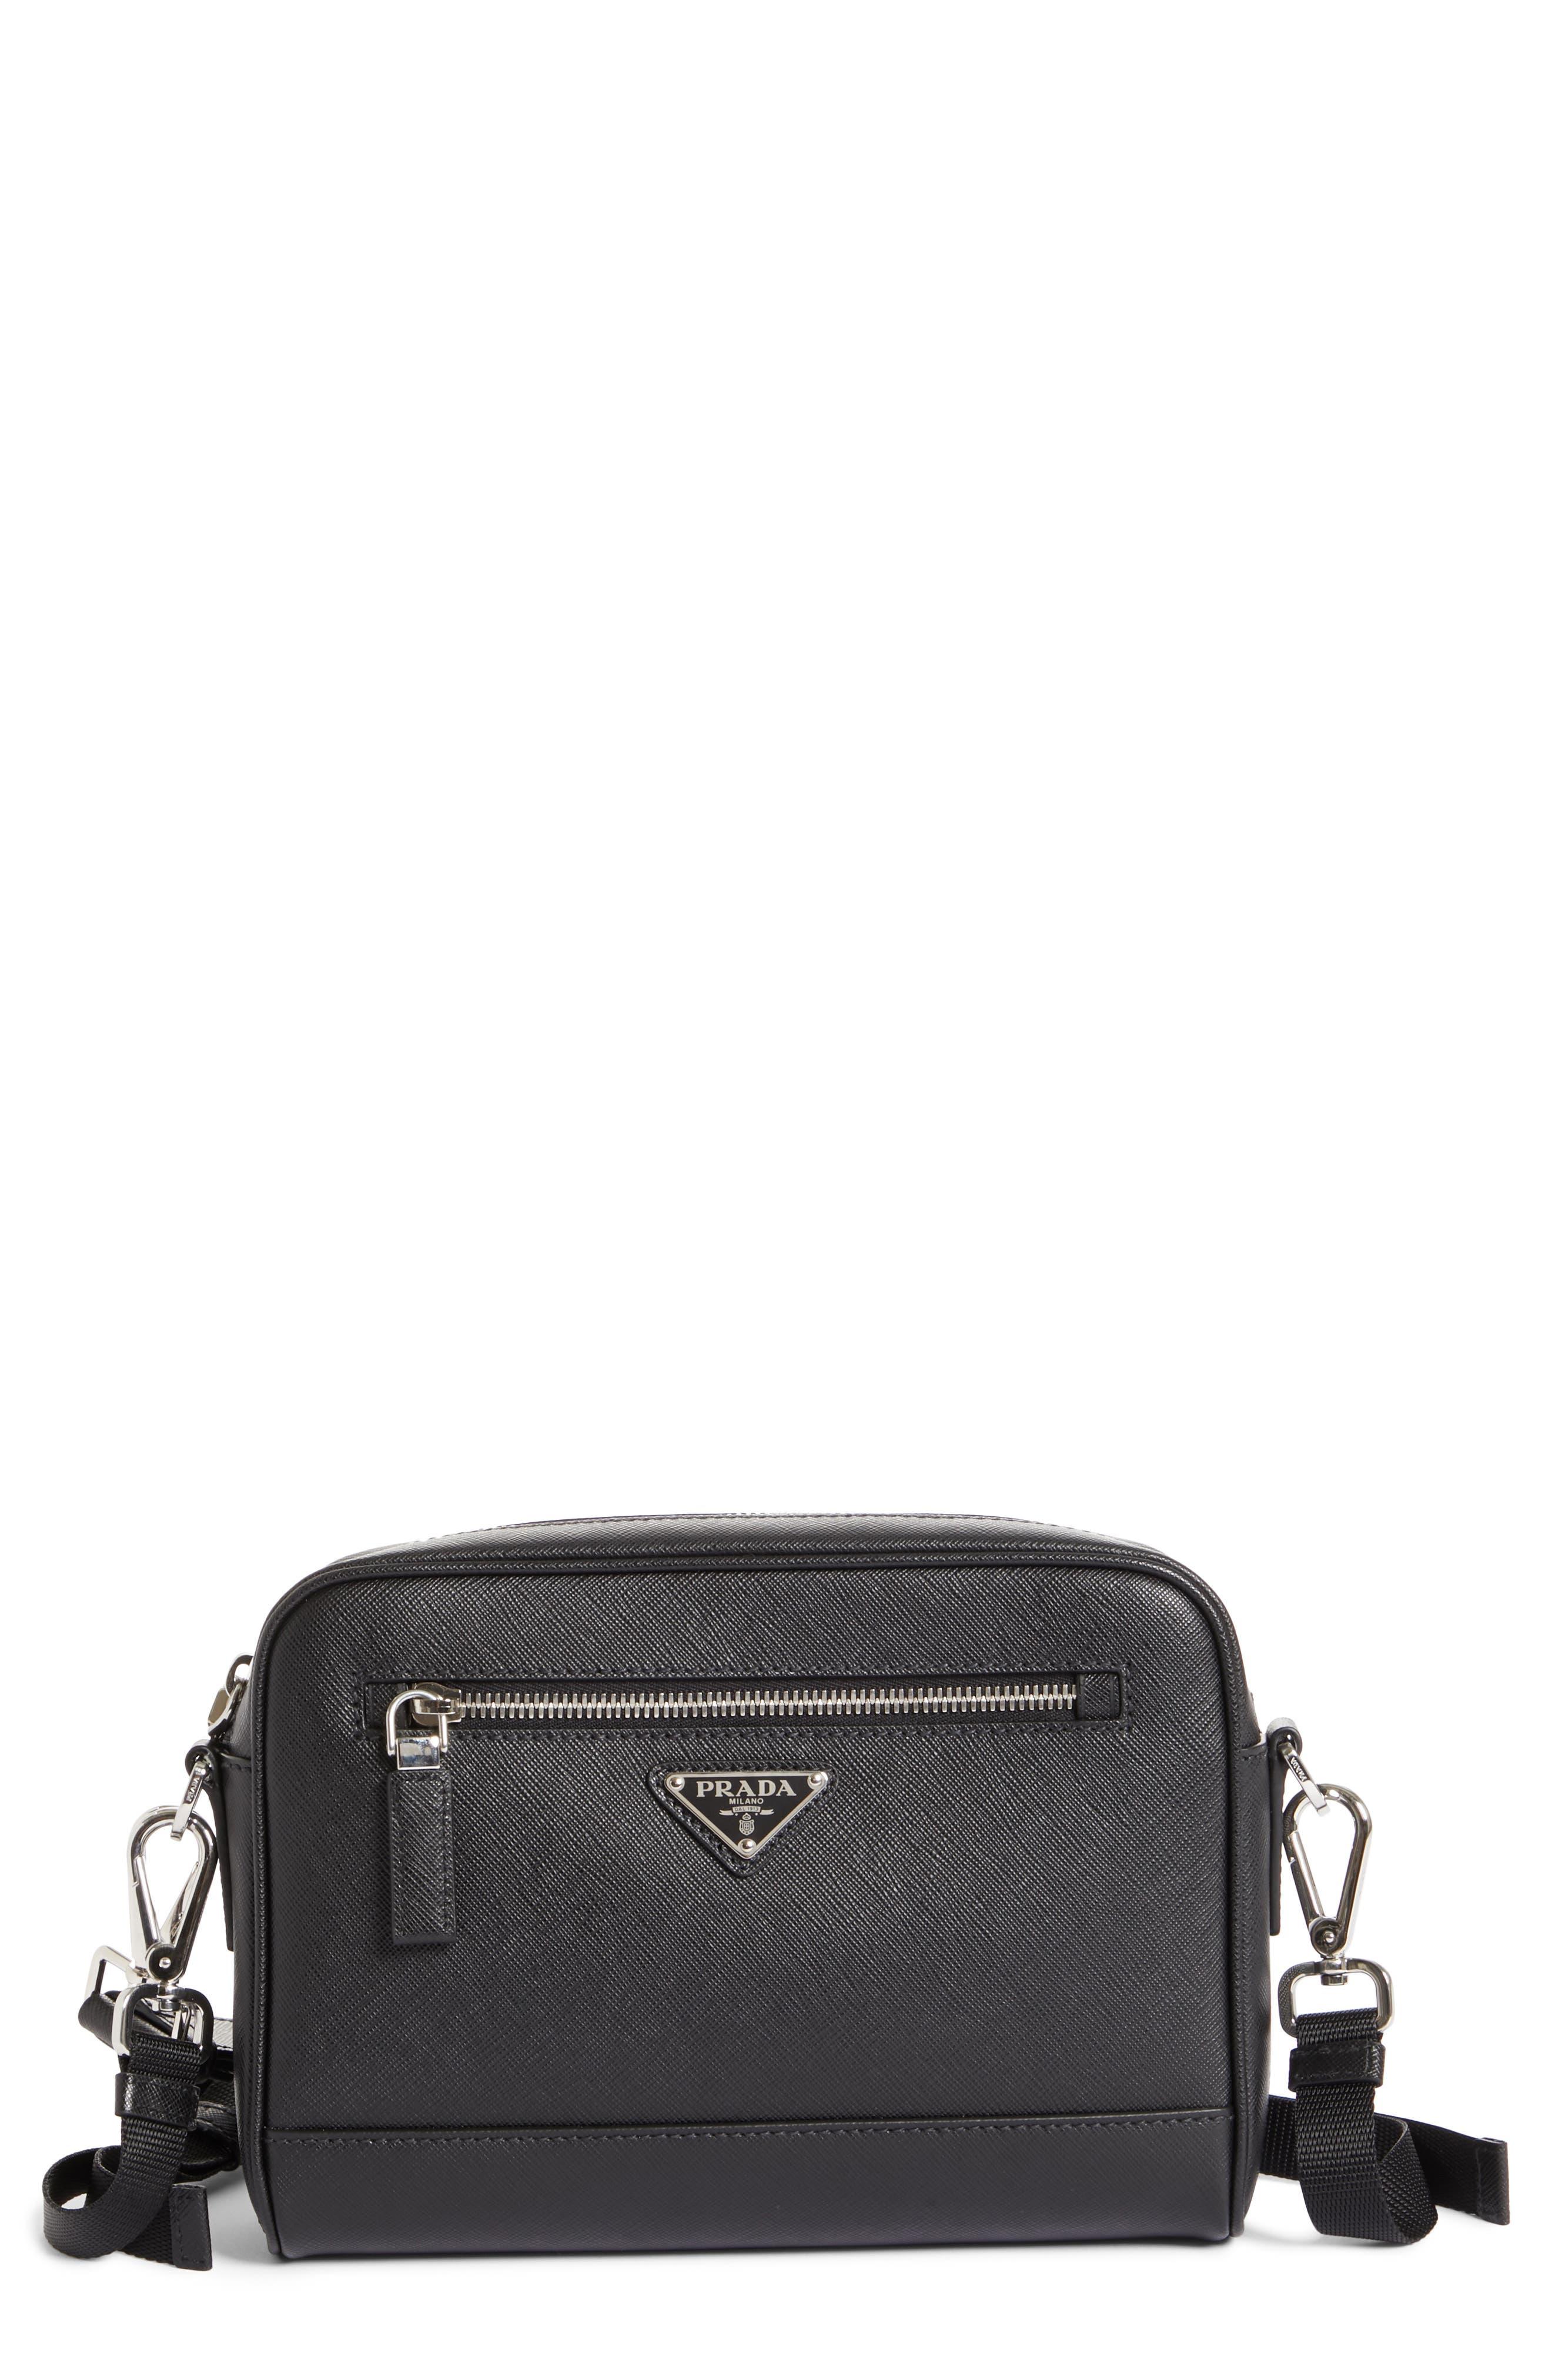 Saffiano Leather Travel Bag,                         Main,                         color, 001